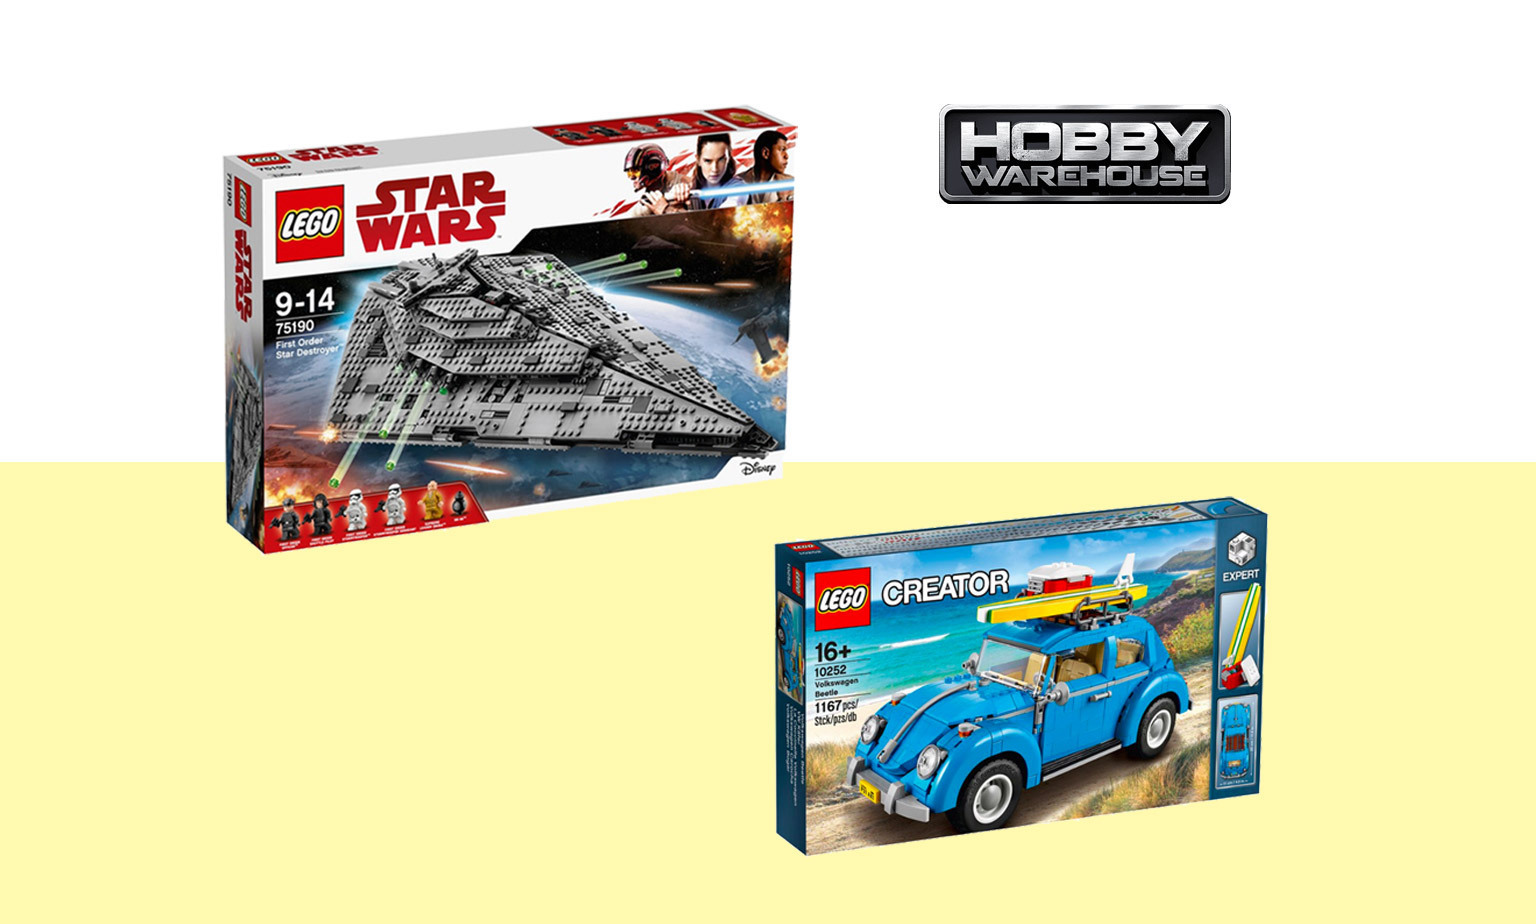 20% off LEGO at Hobby Warehouse*